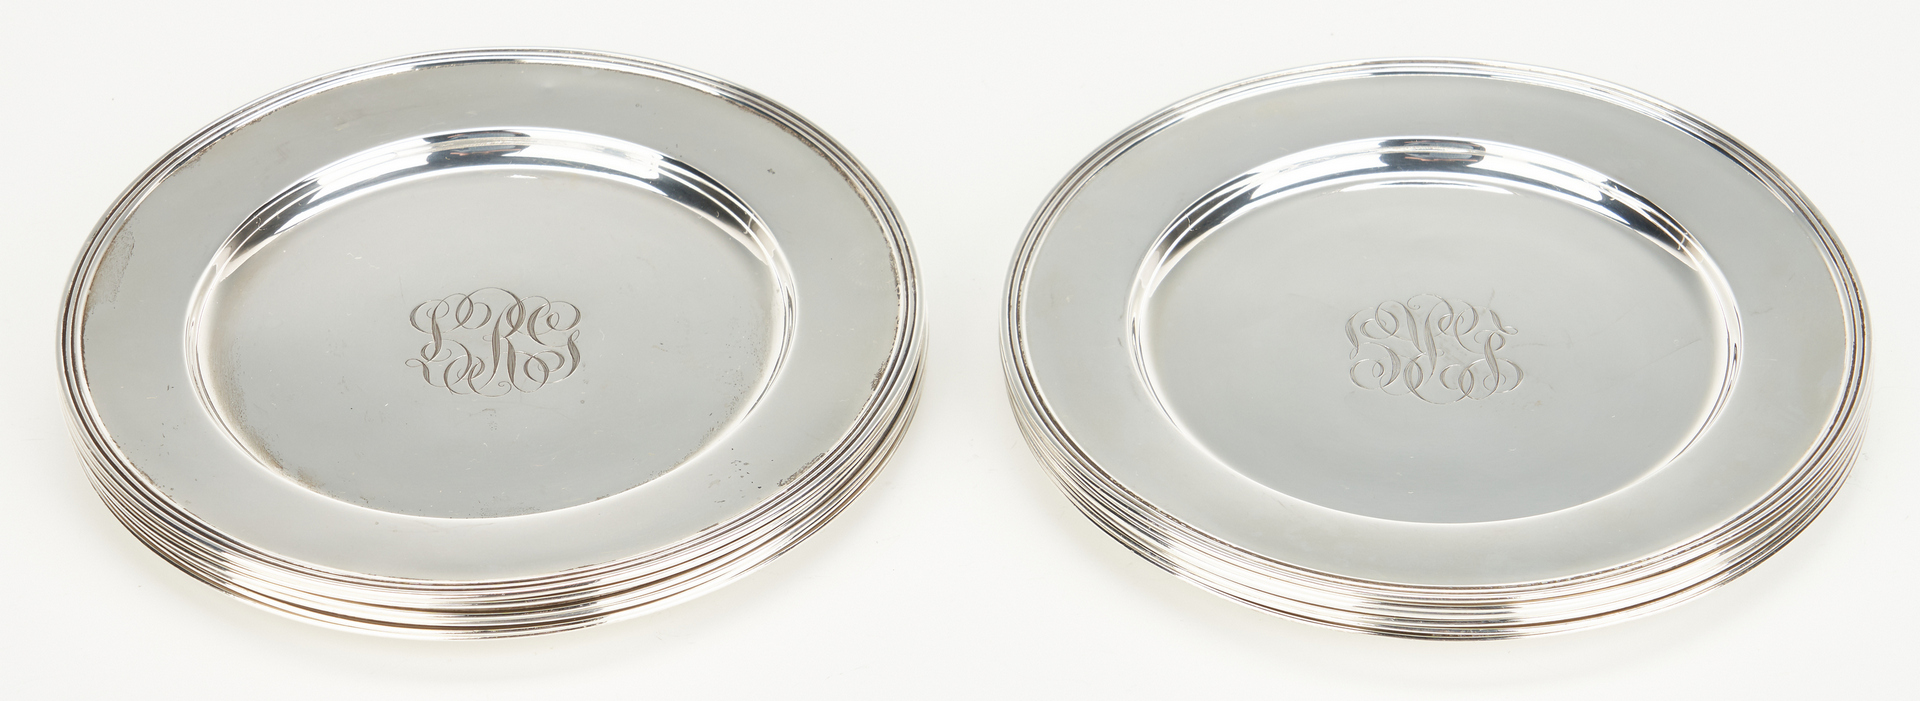 Lot 813: 12 Sterling Silver Bread Plates, JS Co.